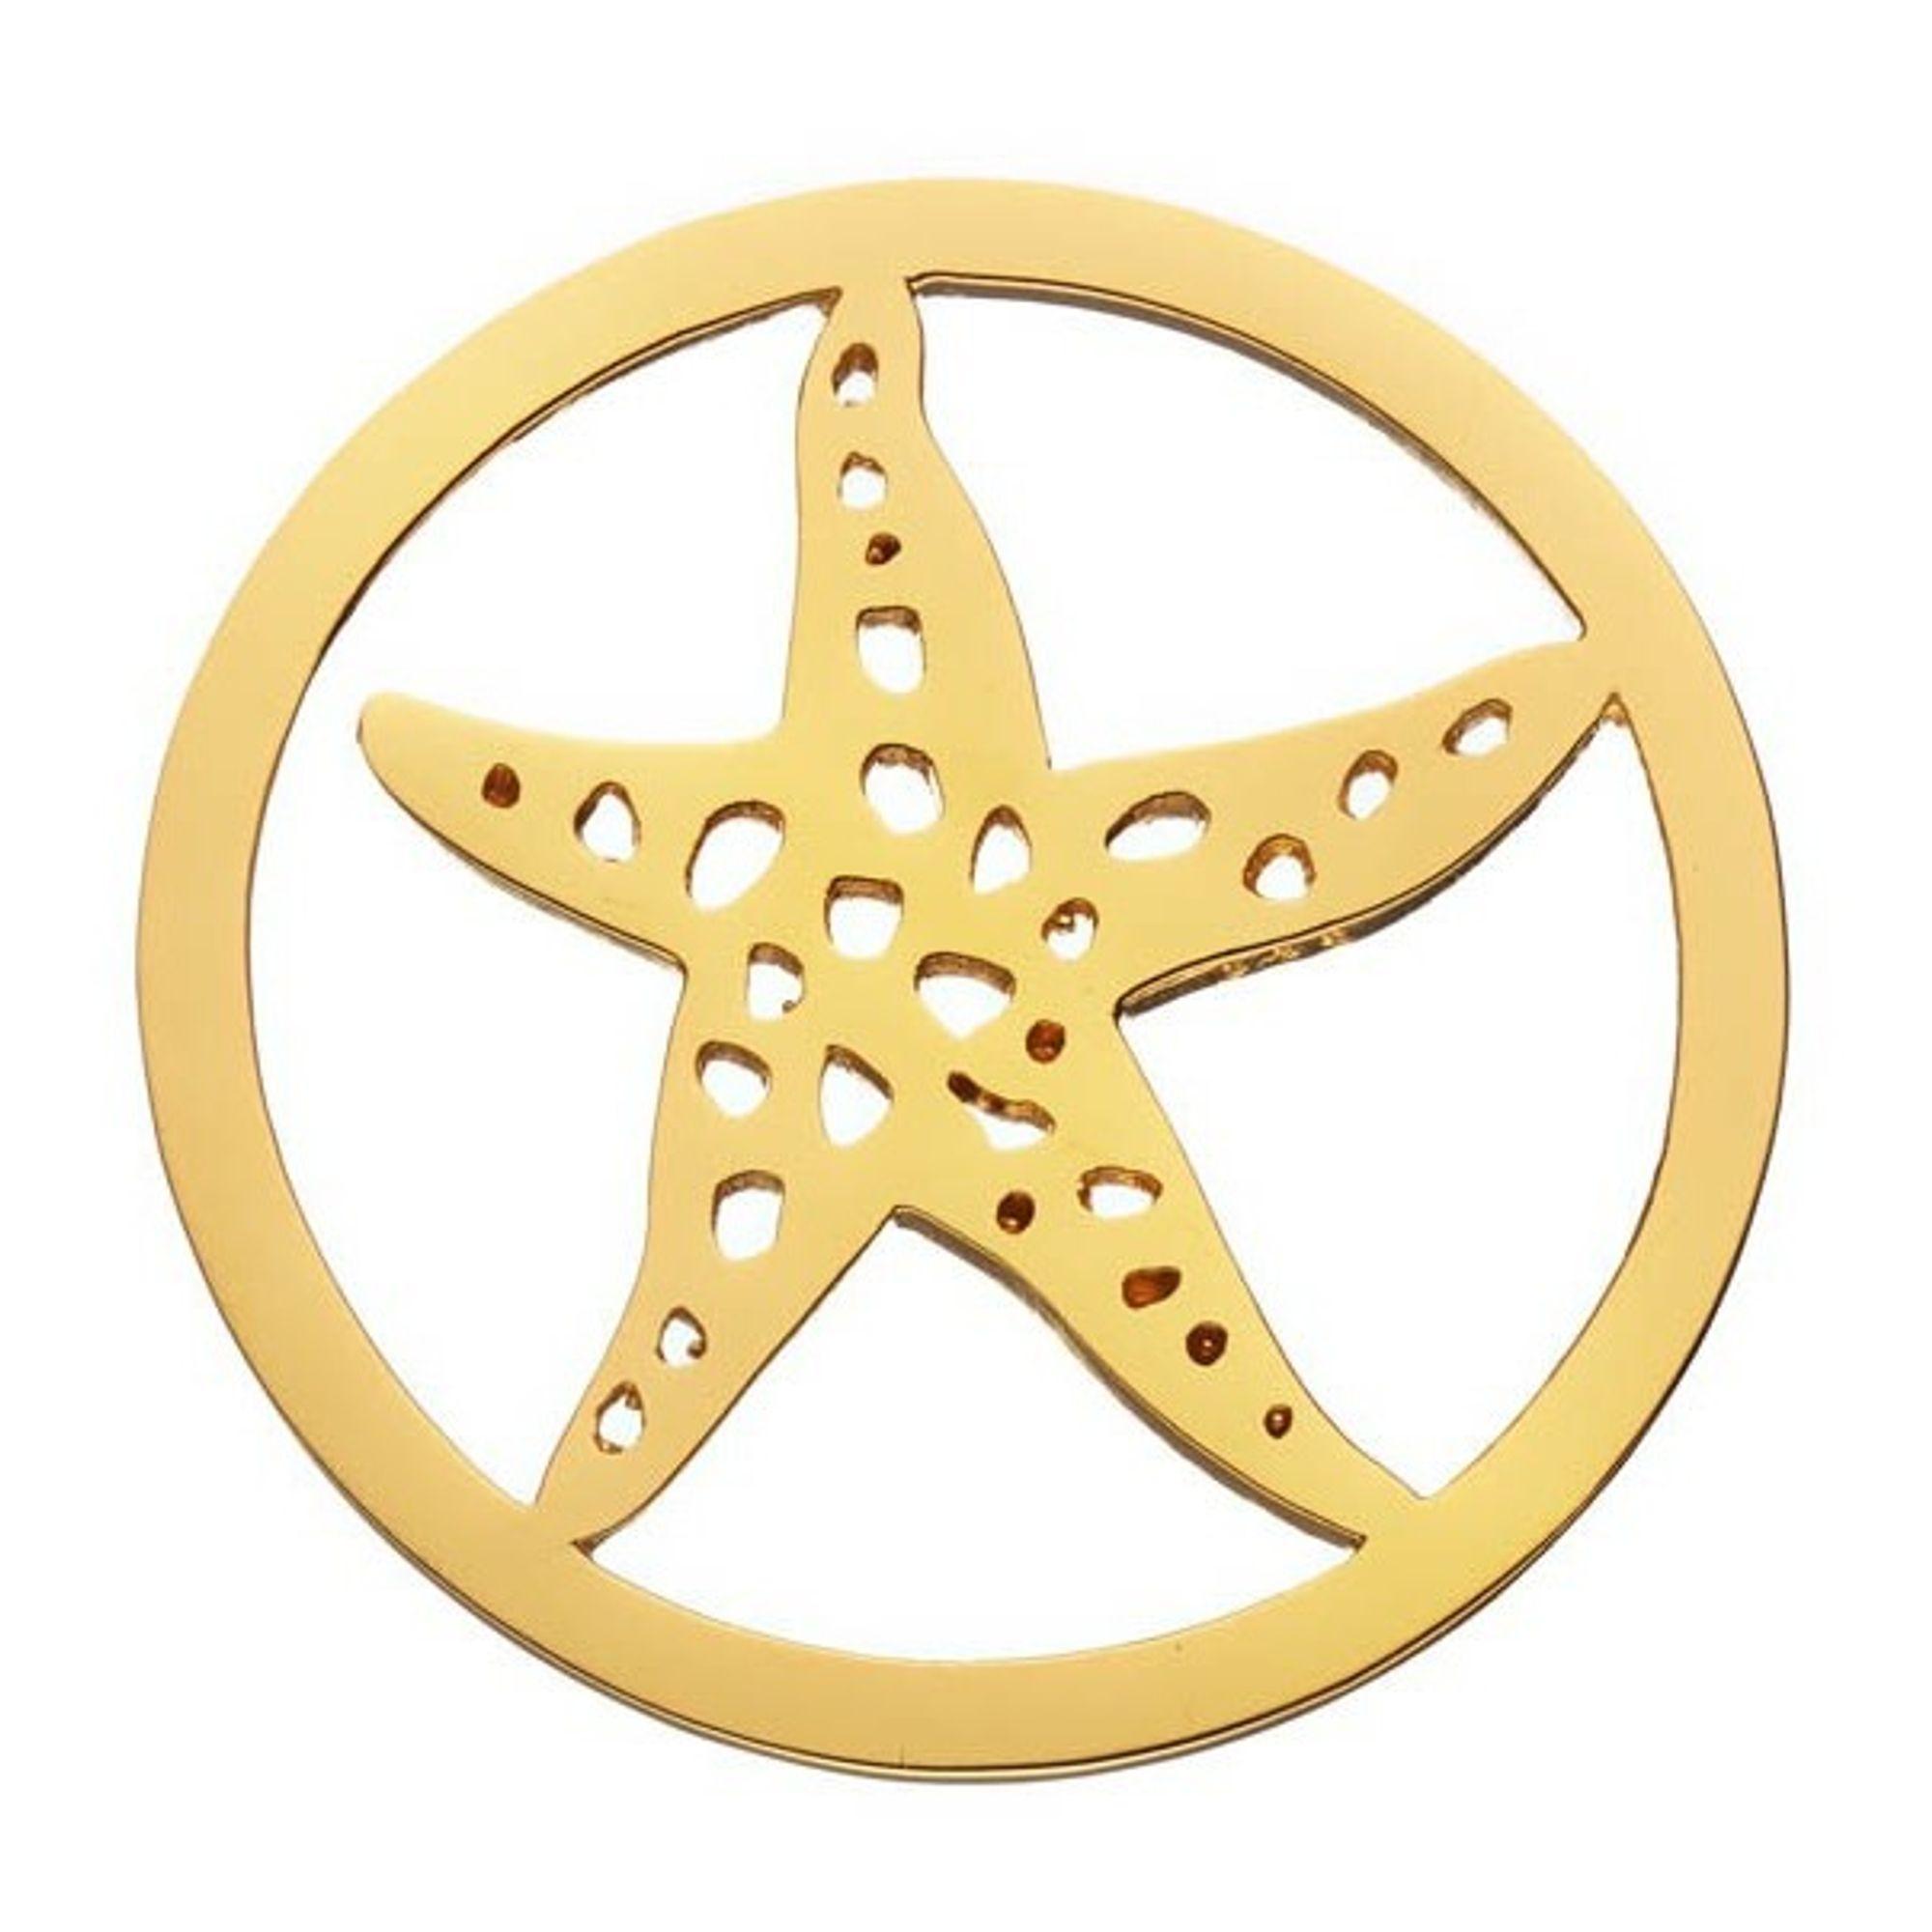 DAISY London HC2019 Münze Platte Seestern Starfisch Halo vergoldet